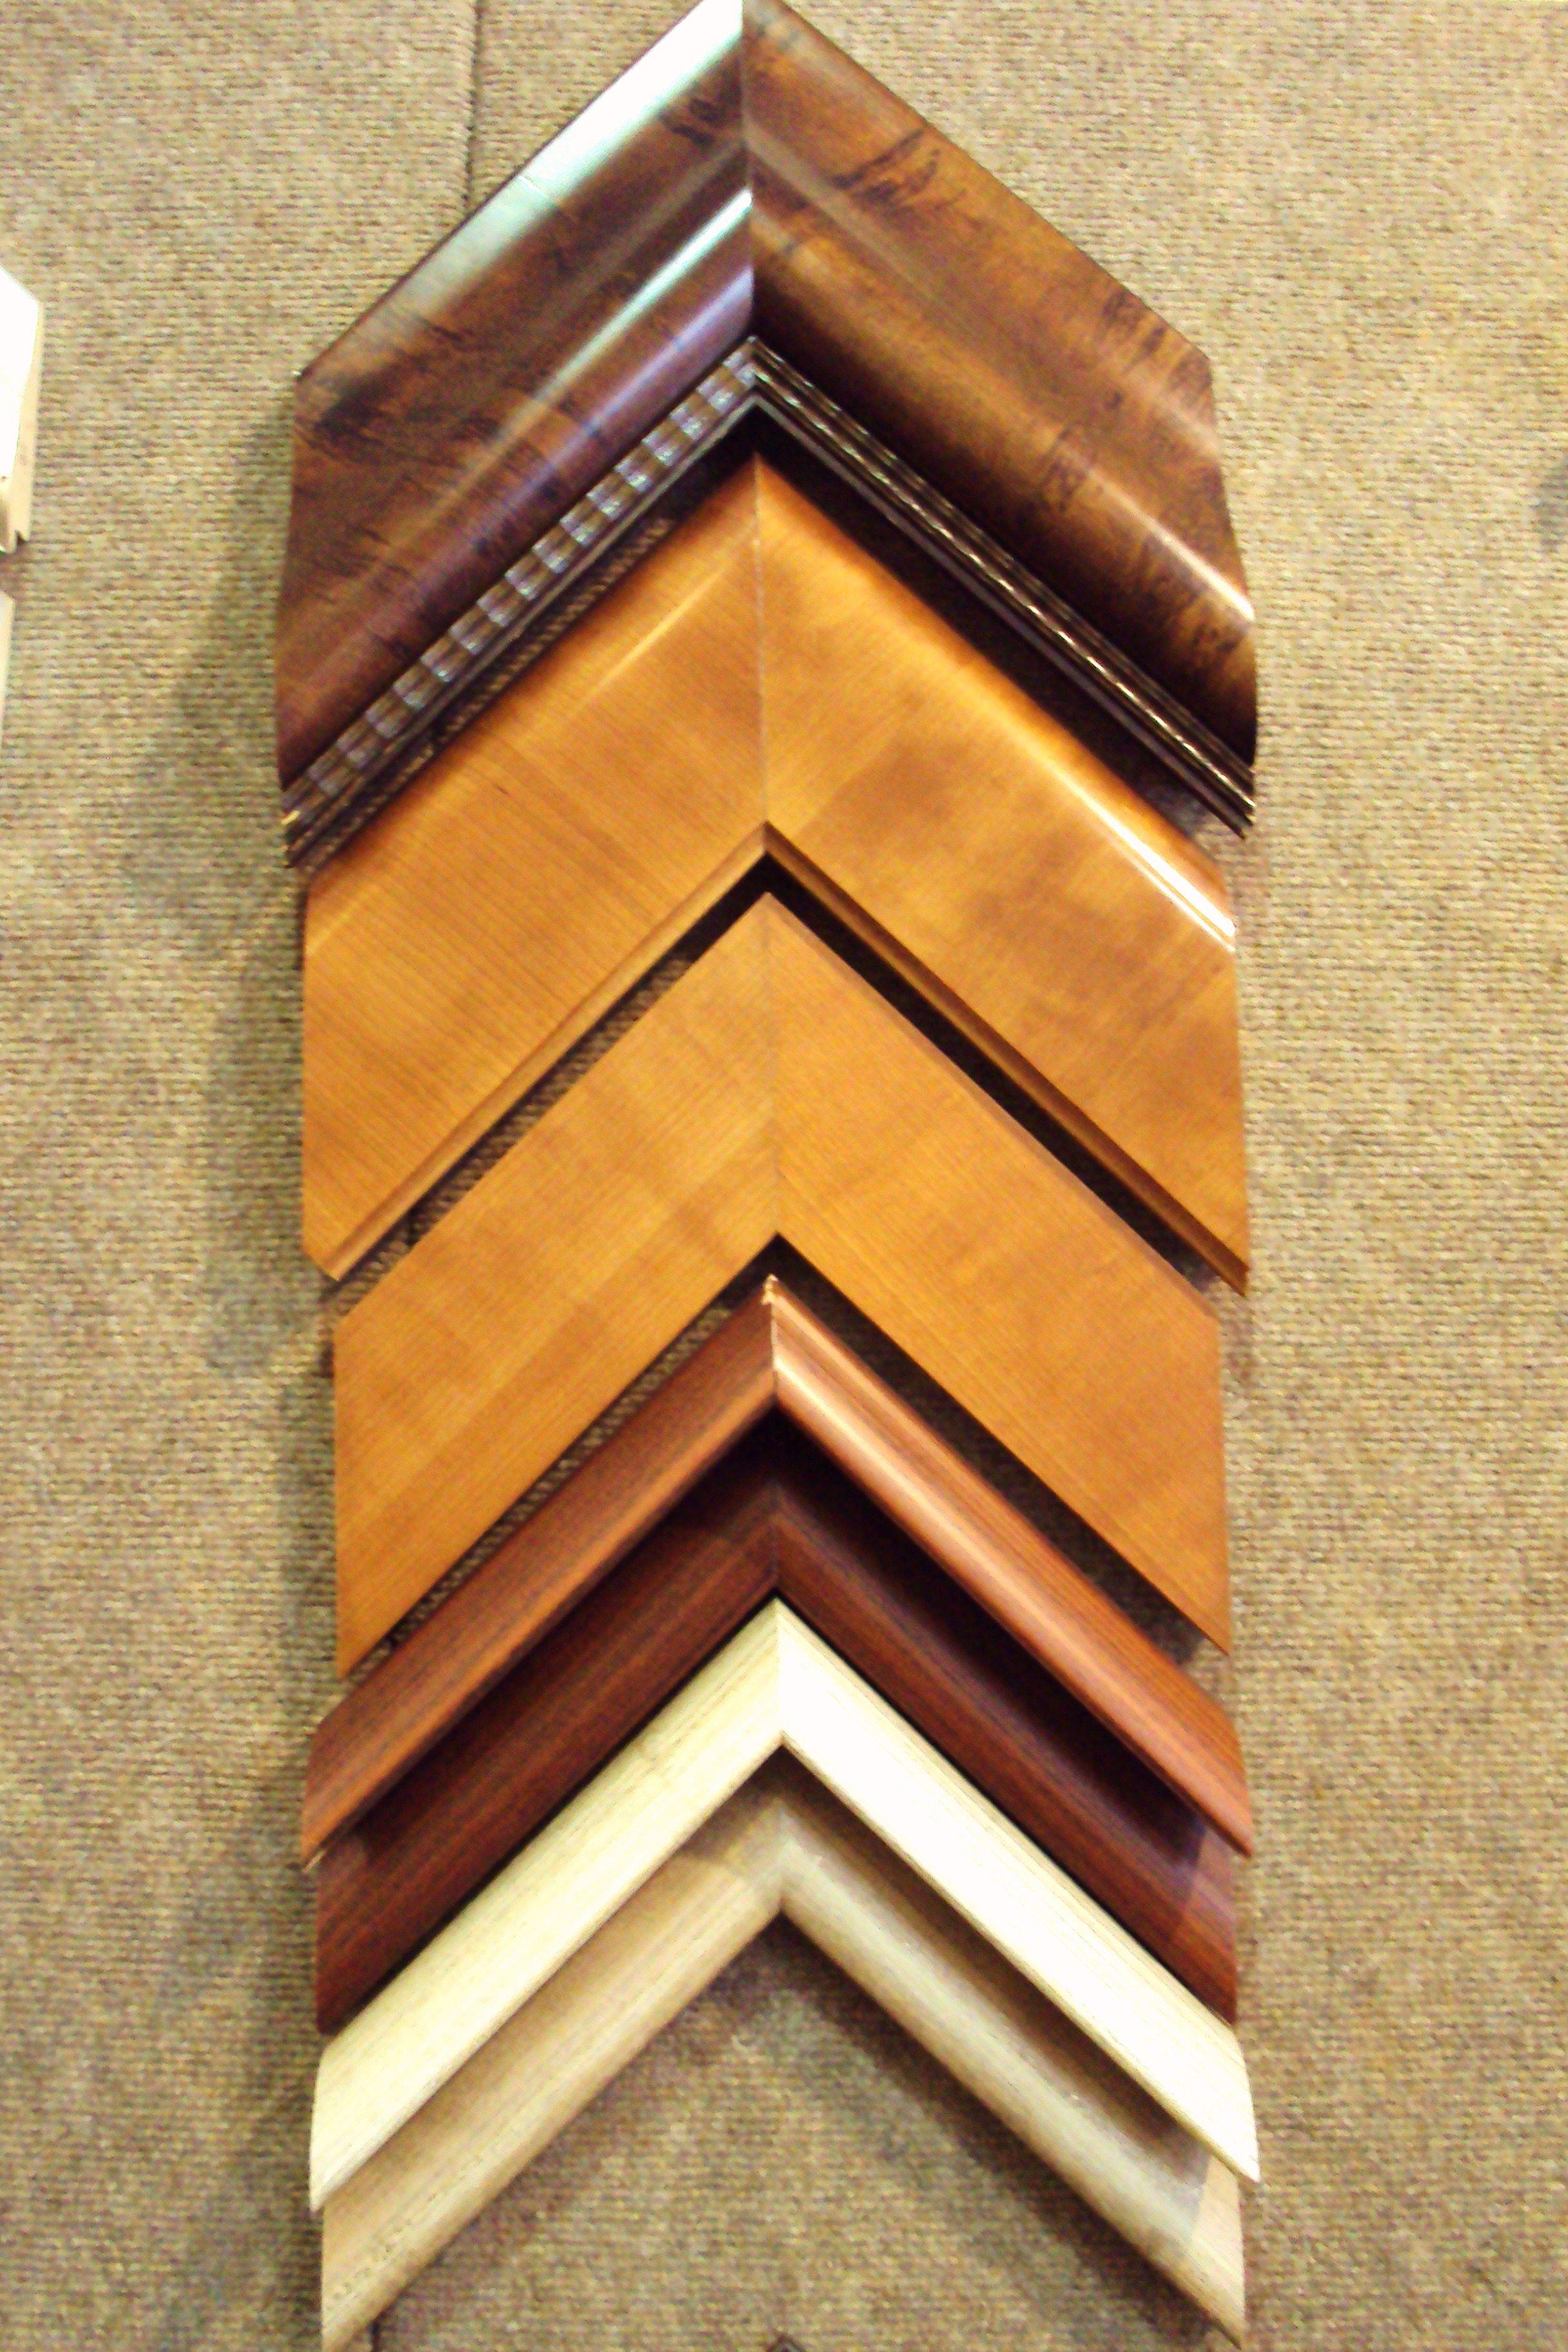 Chapadas en madera anchas